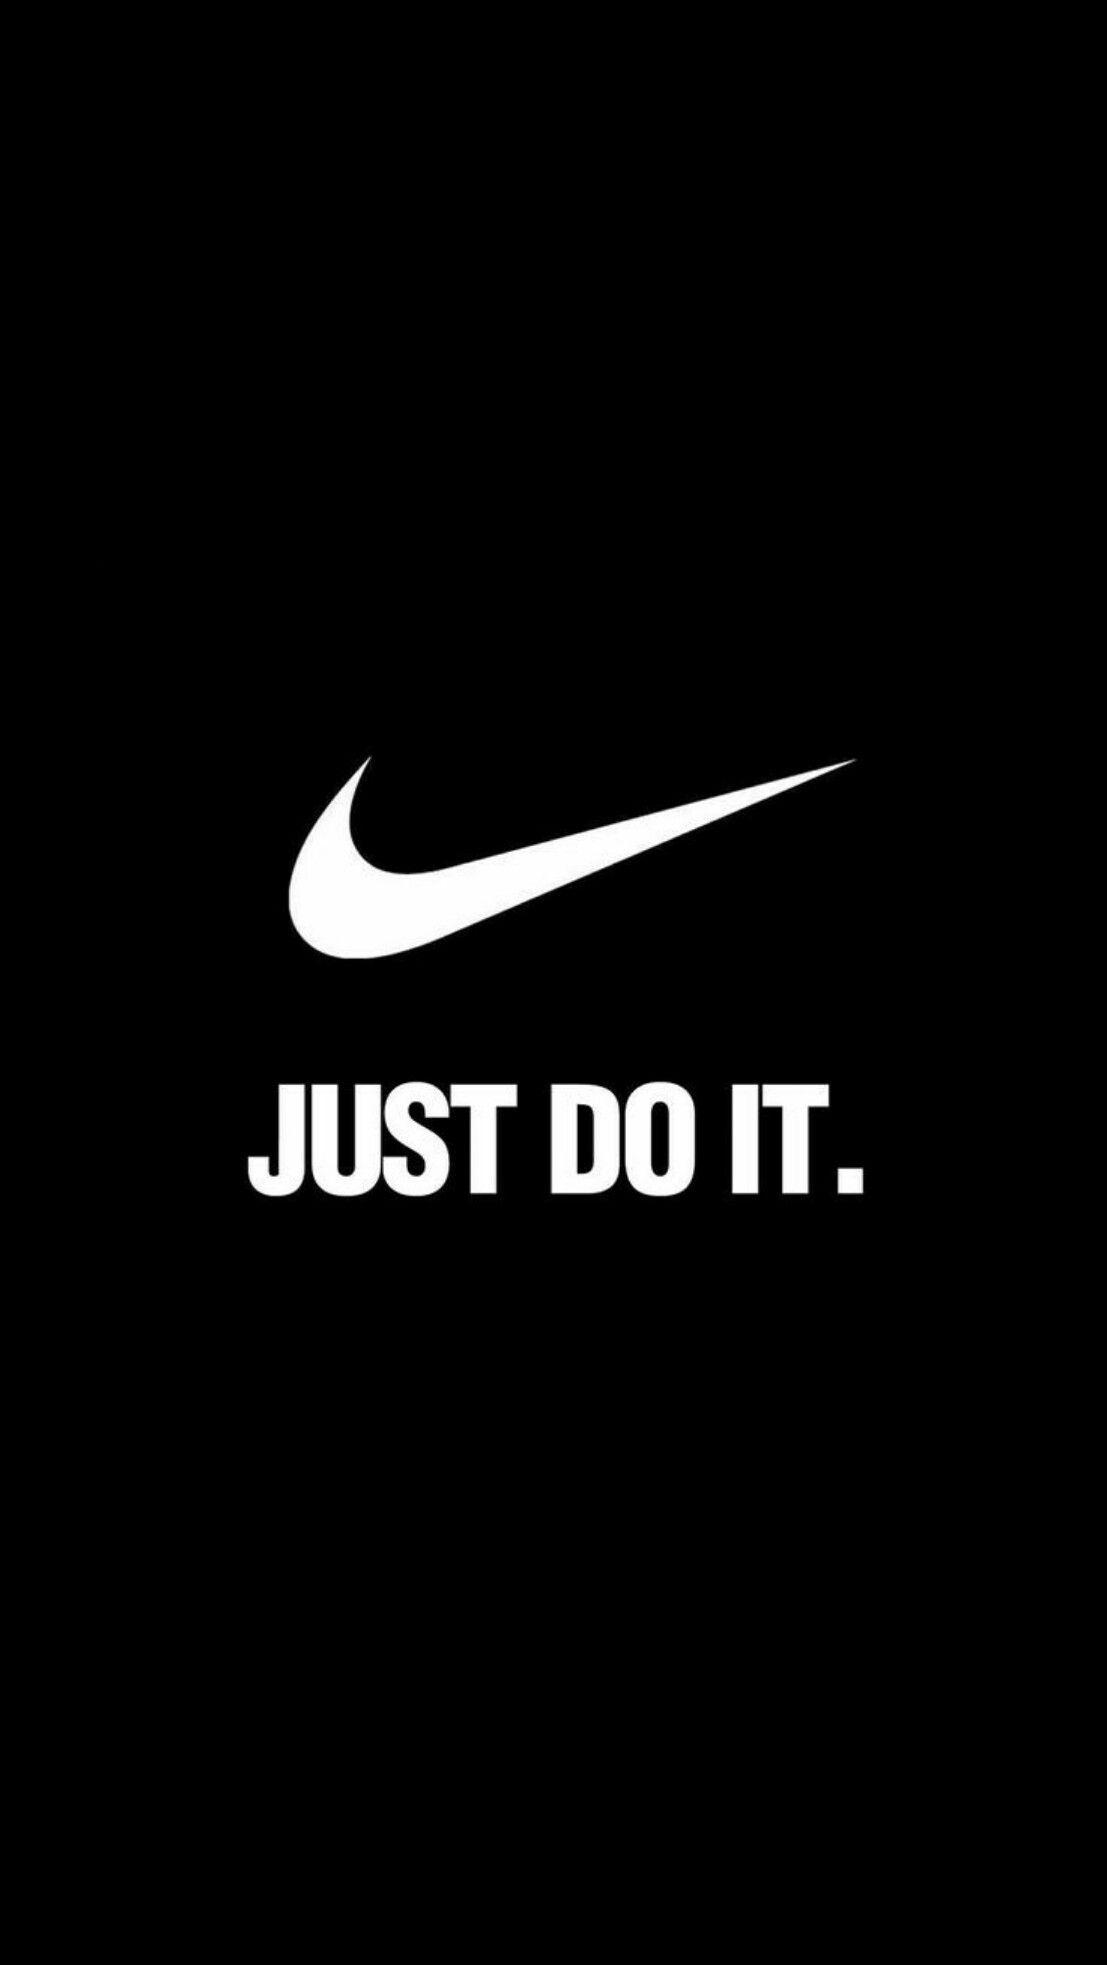 Nike Black Wallpaper Iphone Android Nike Logo Wallpapers Nike Wallpaper Iphone Nike Wallpaper